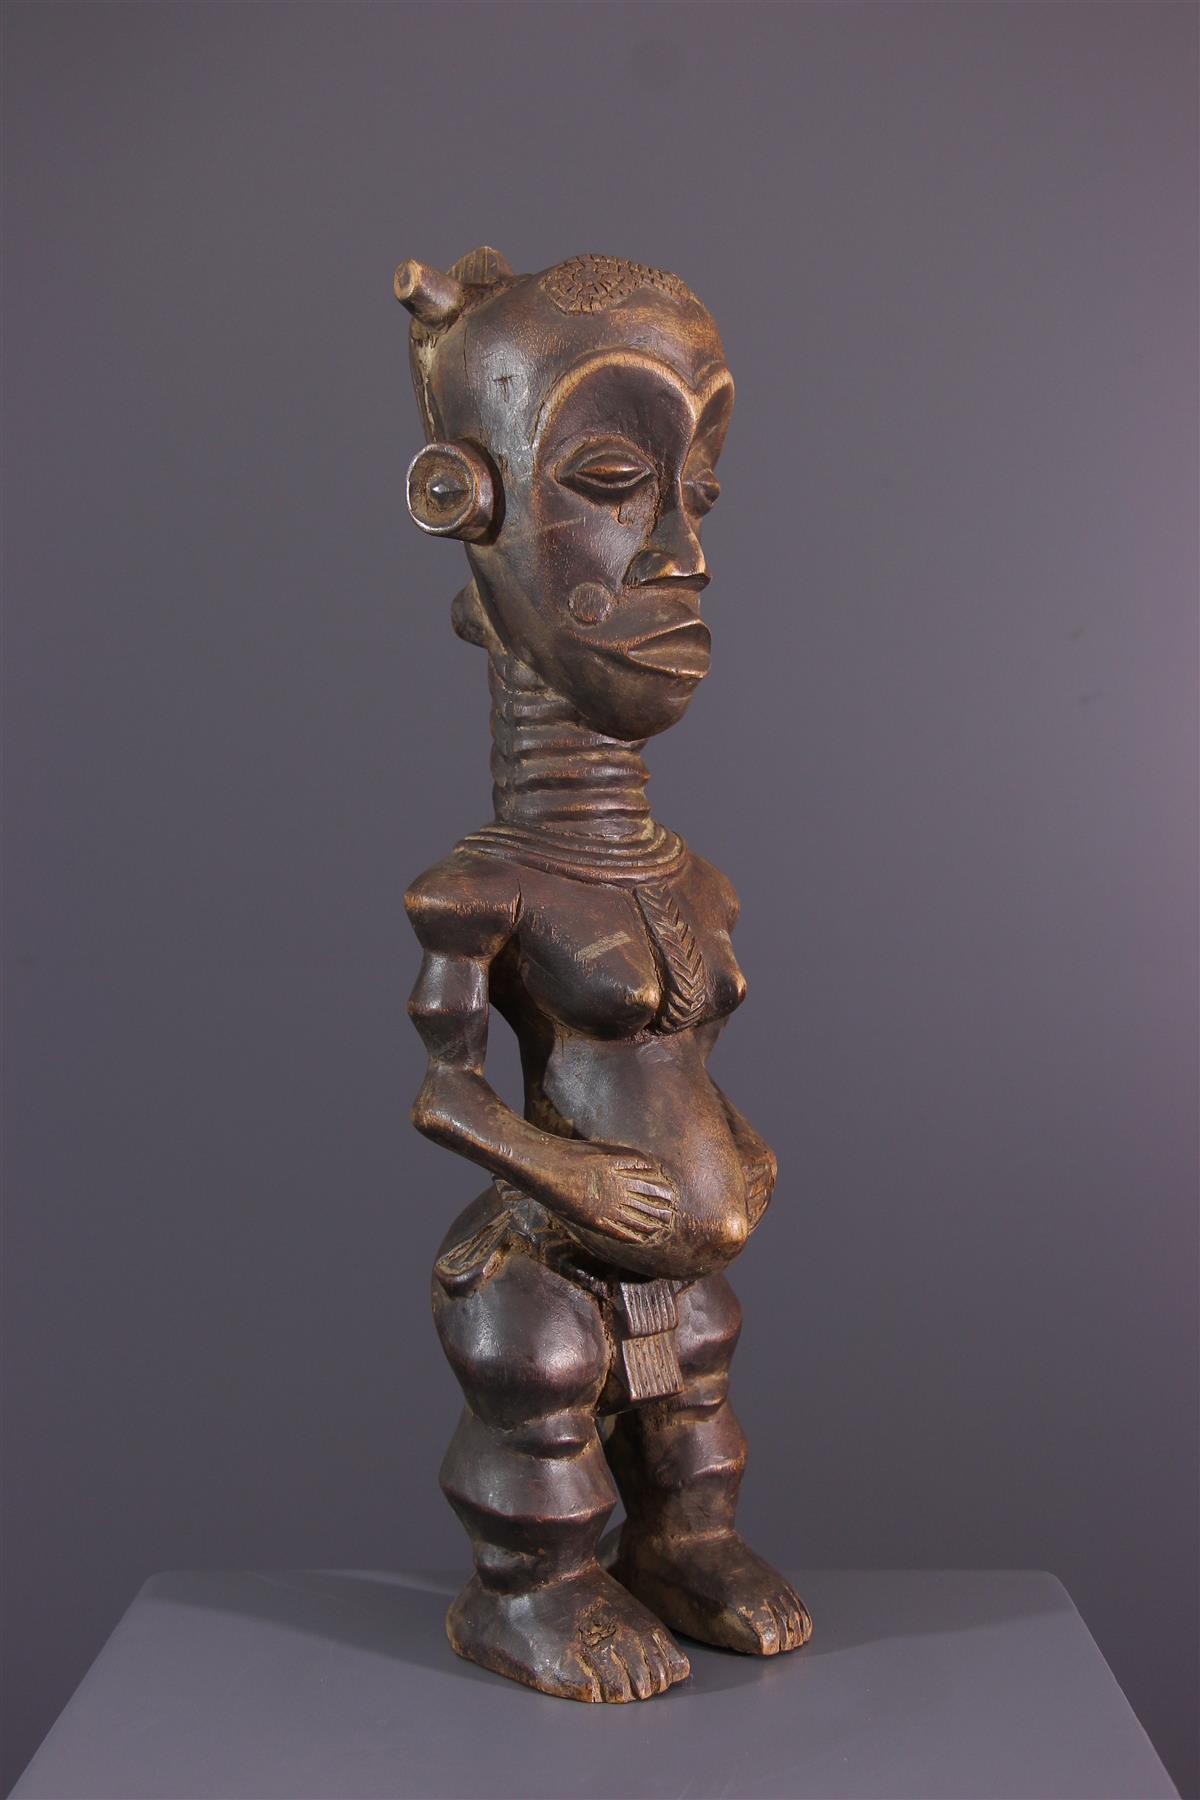 Statuette Luluwa - Art africain